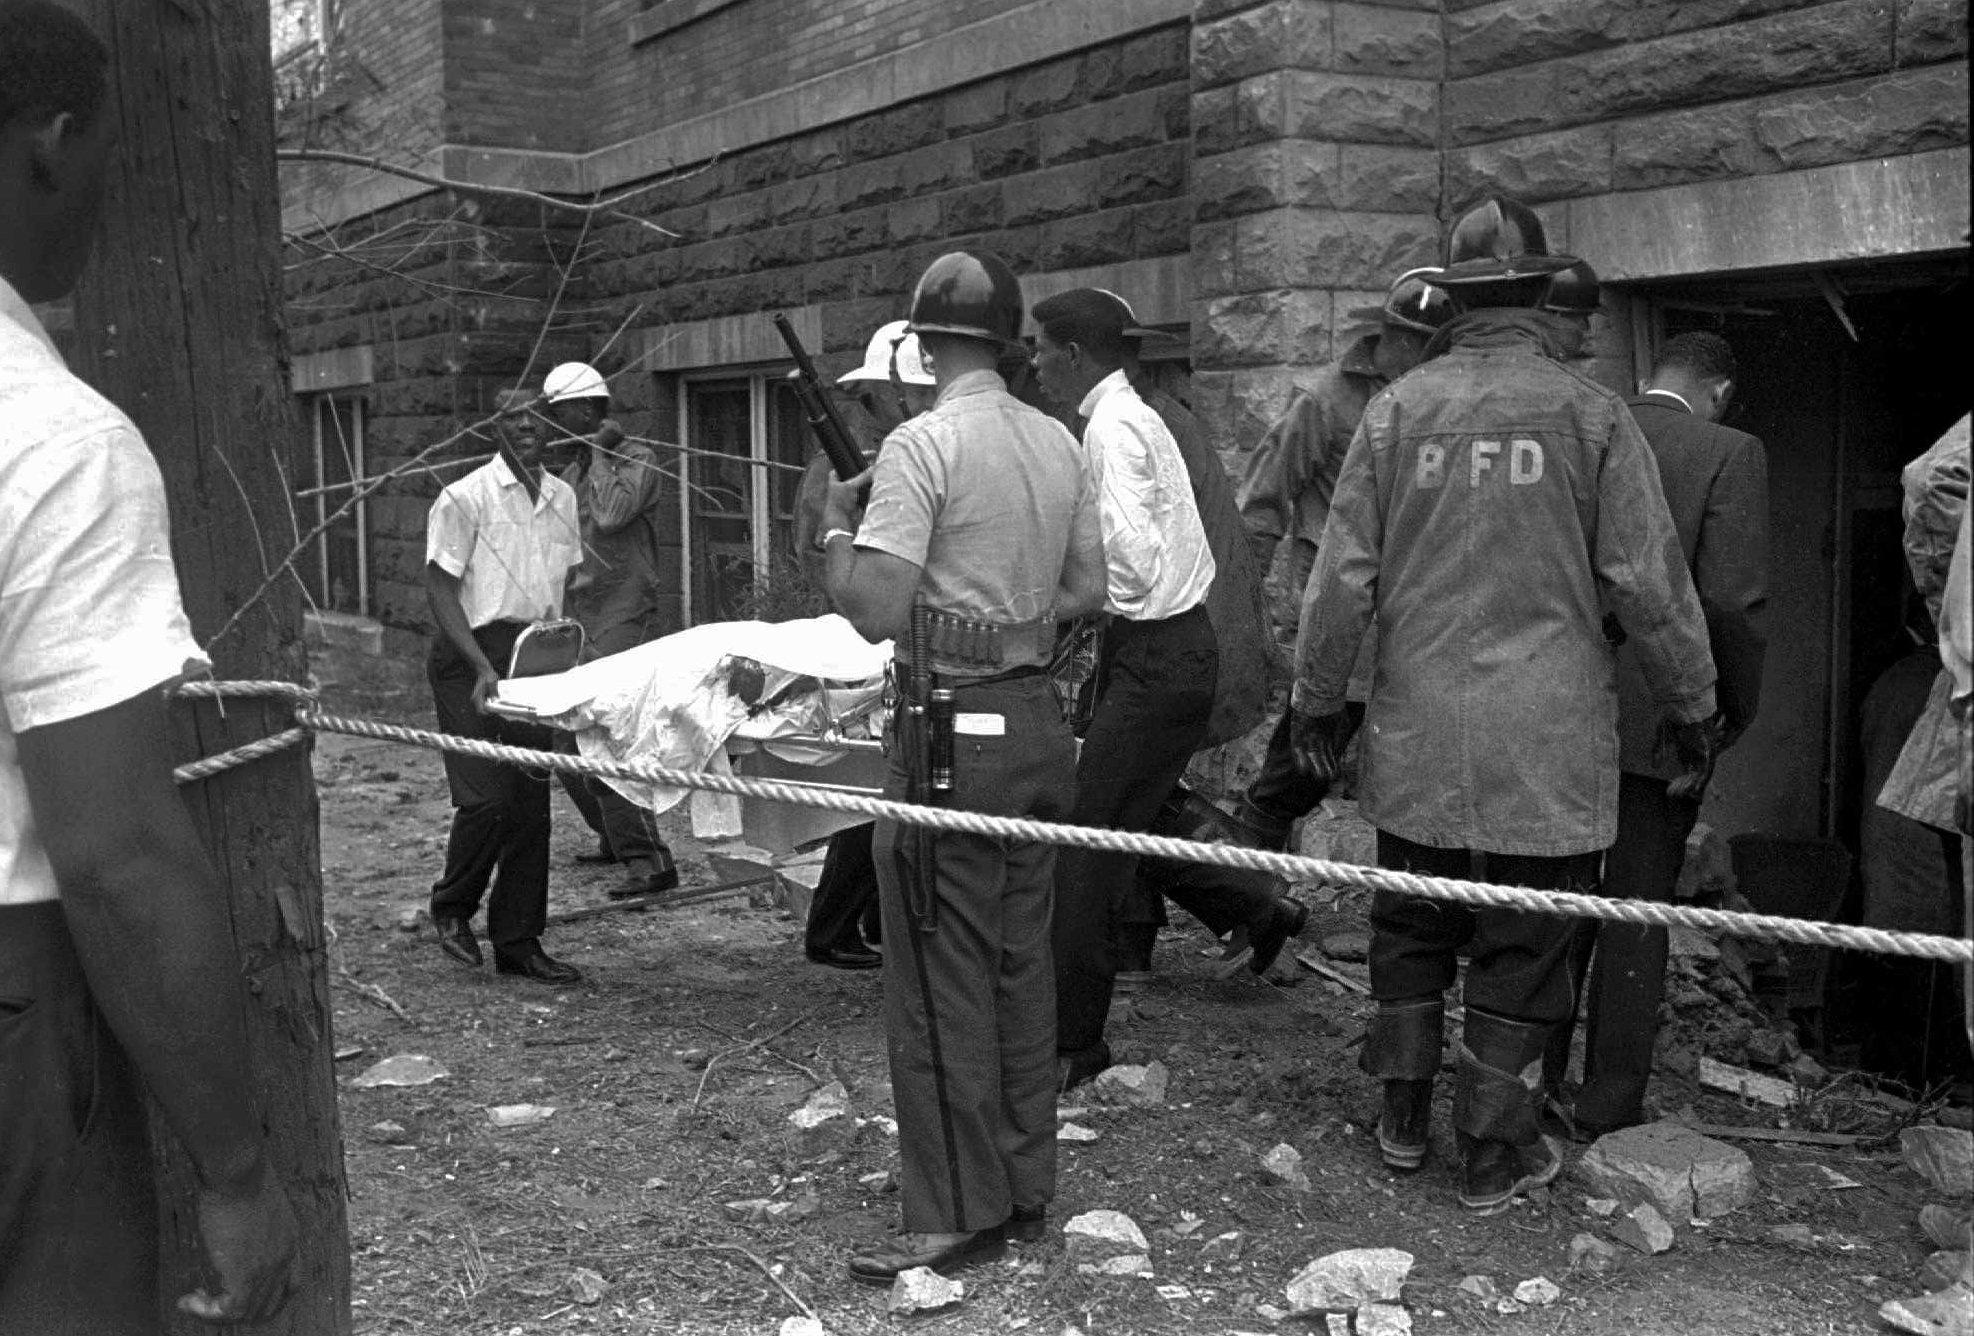 16th Street Baptist Church bombing